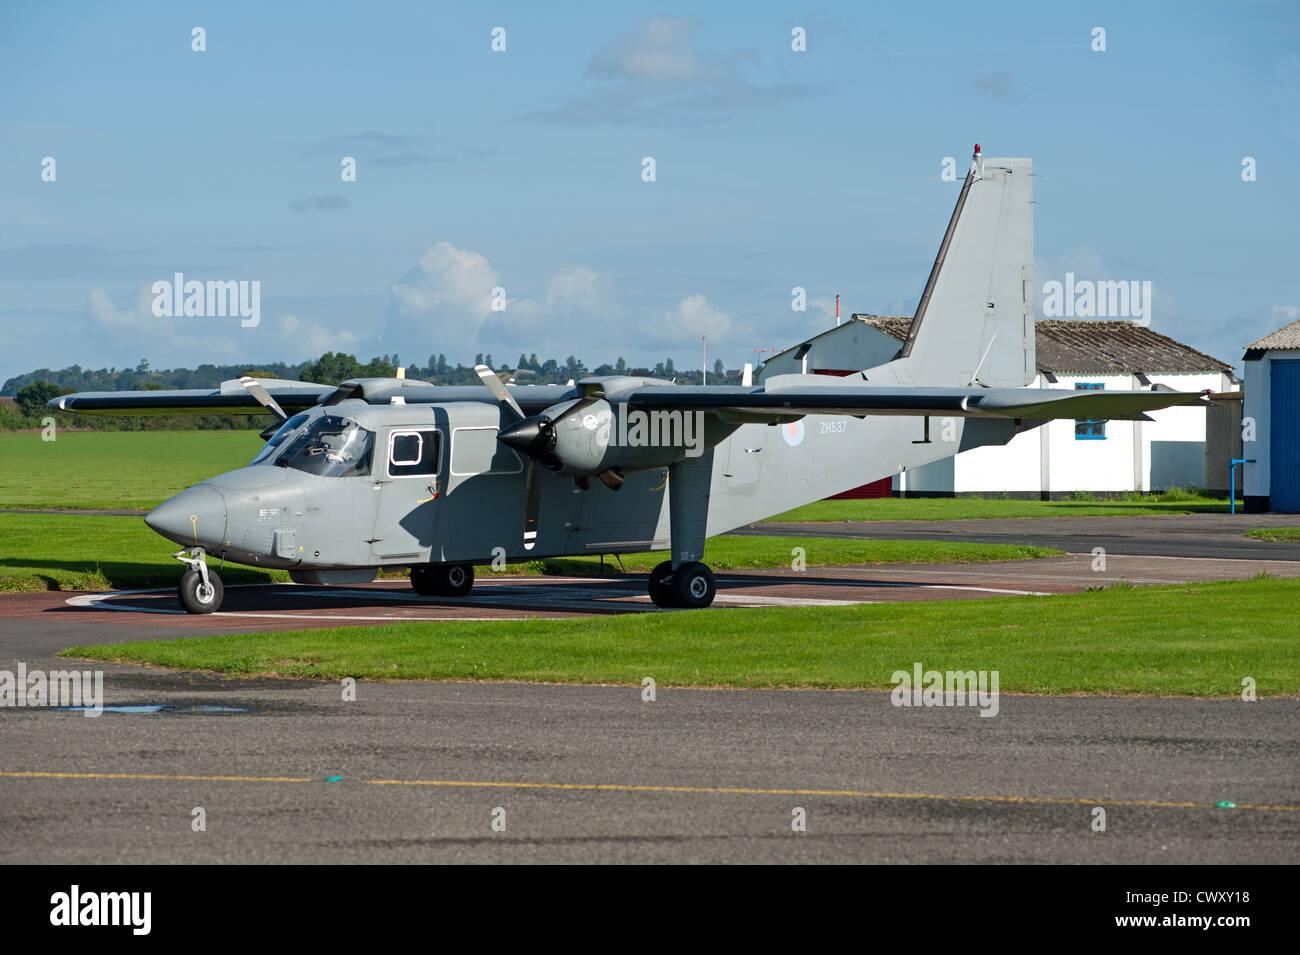 PBN 2T Islander CC2 at Halfpenny Green Airport, Wolverhampton.  SCO 8365 - Stock Image